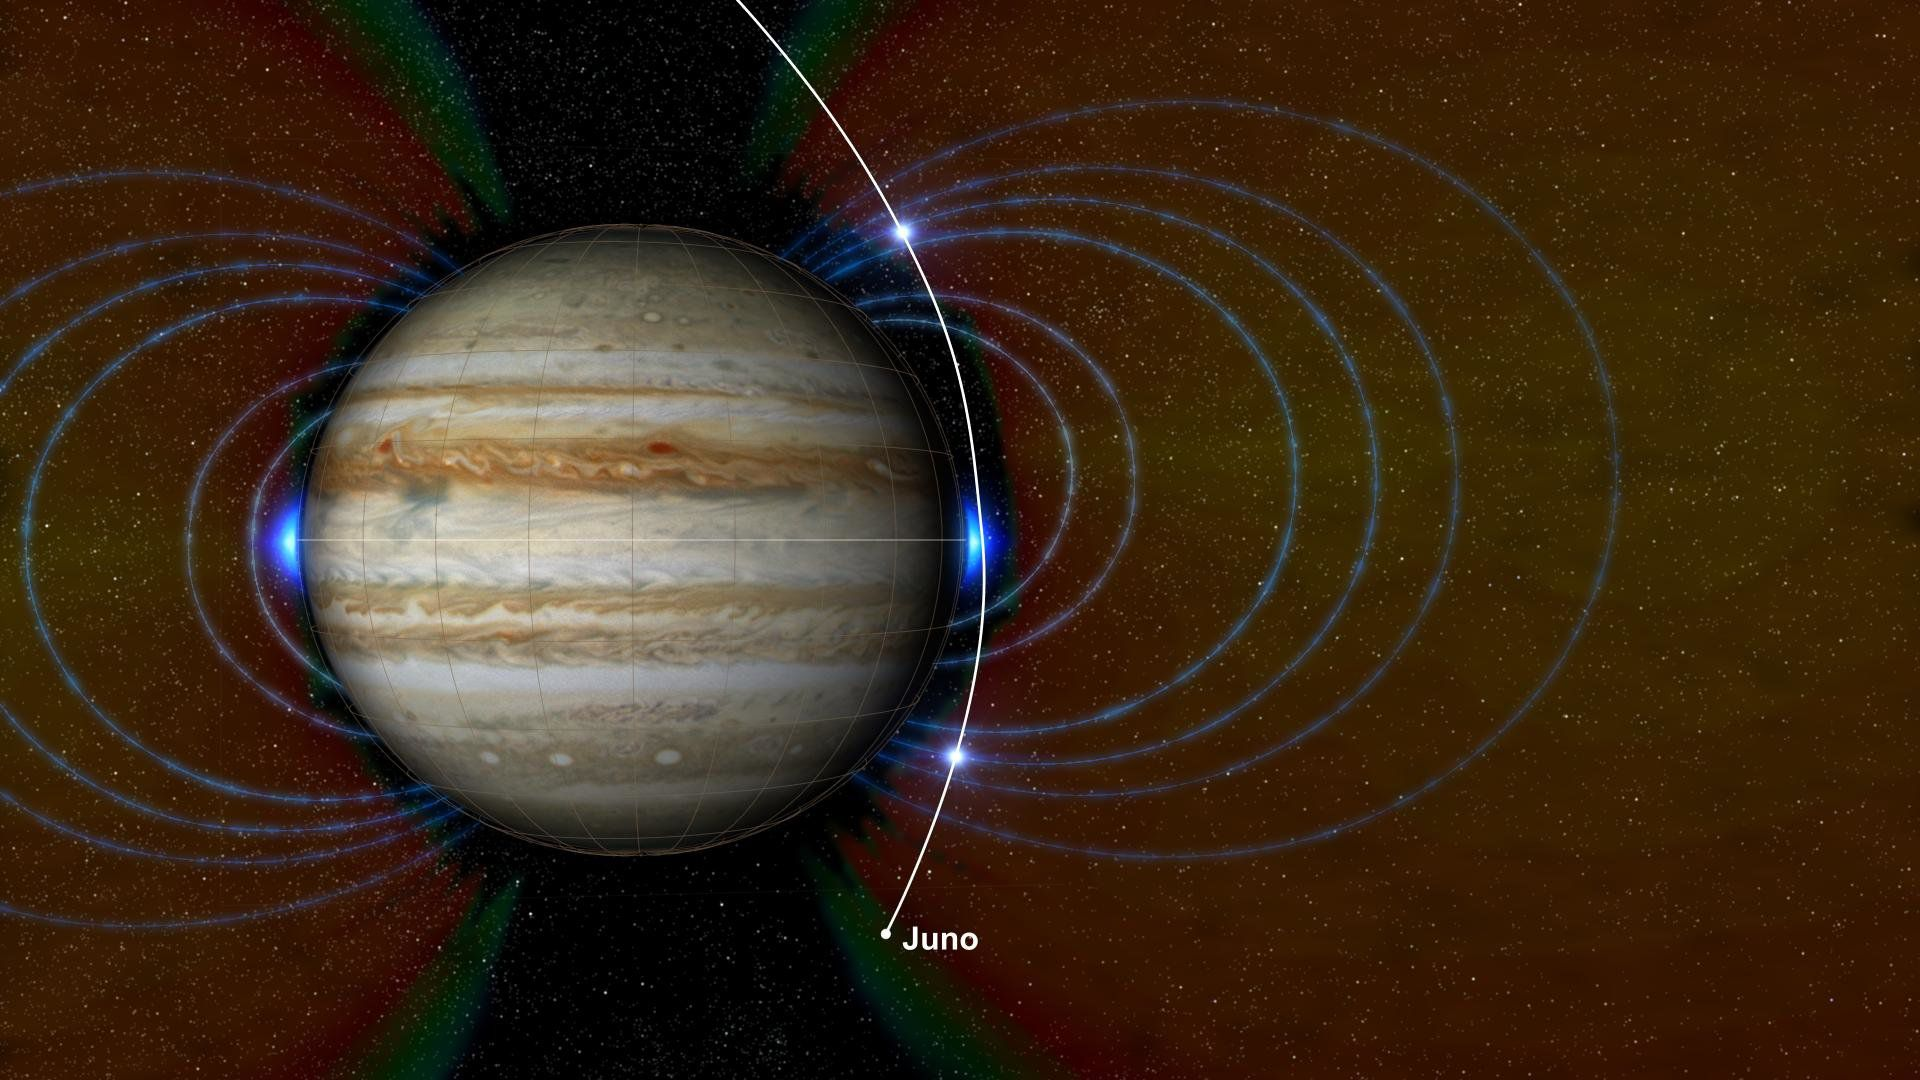 Зонд Juno измерил глубину огромного красного пятна наЮпитере